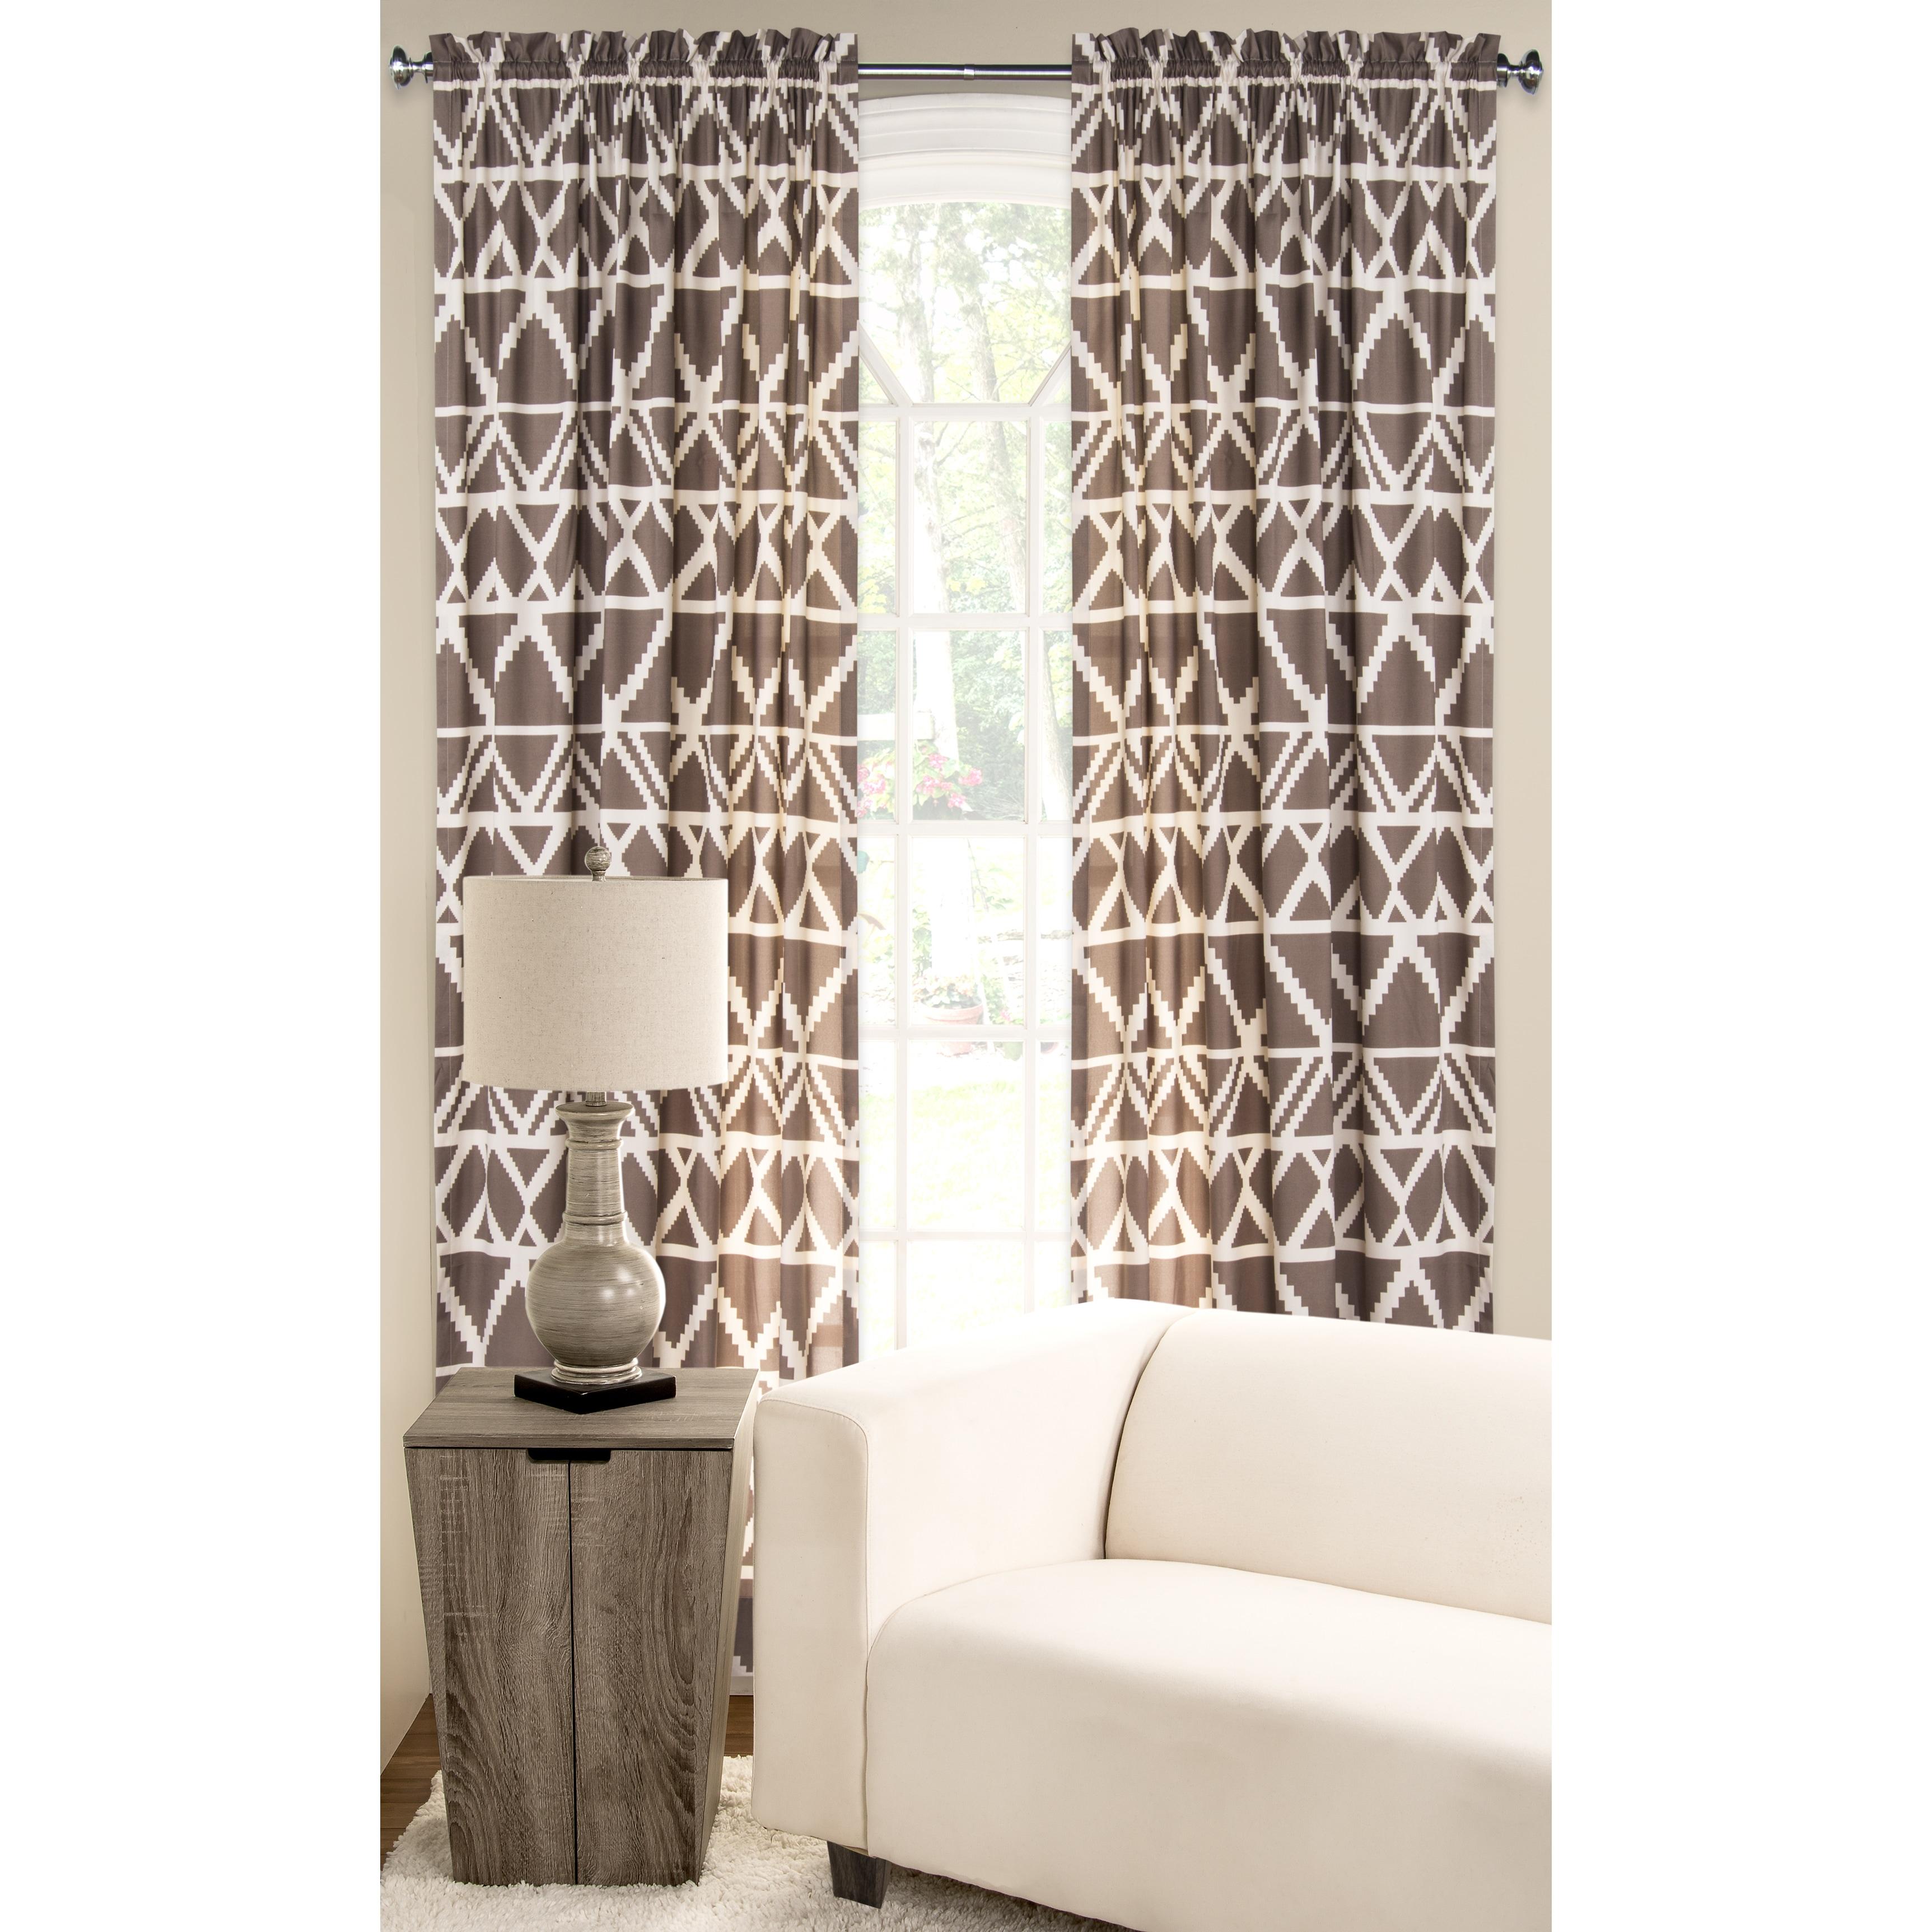 PoloGear Tan Polyester Blend Geometric Tribal Pattern Window Curtain ...